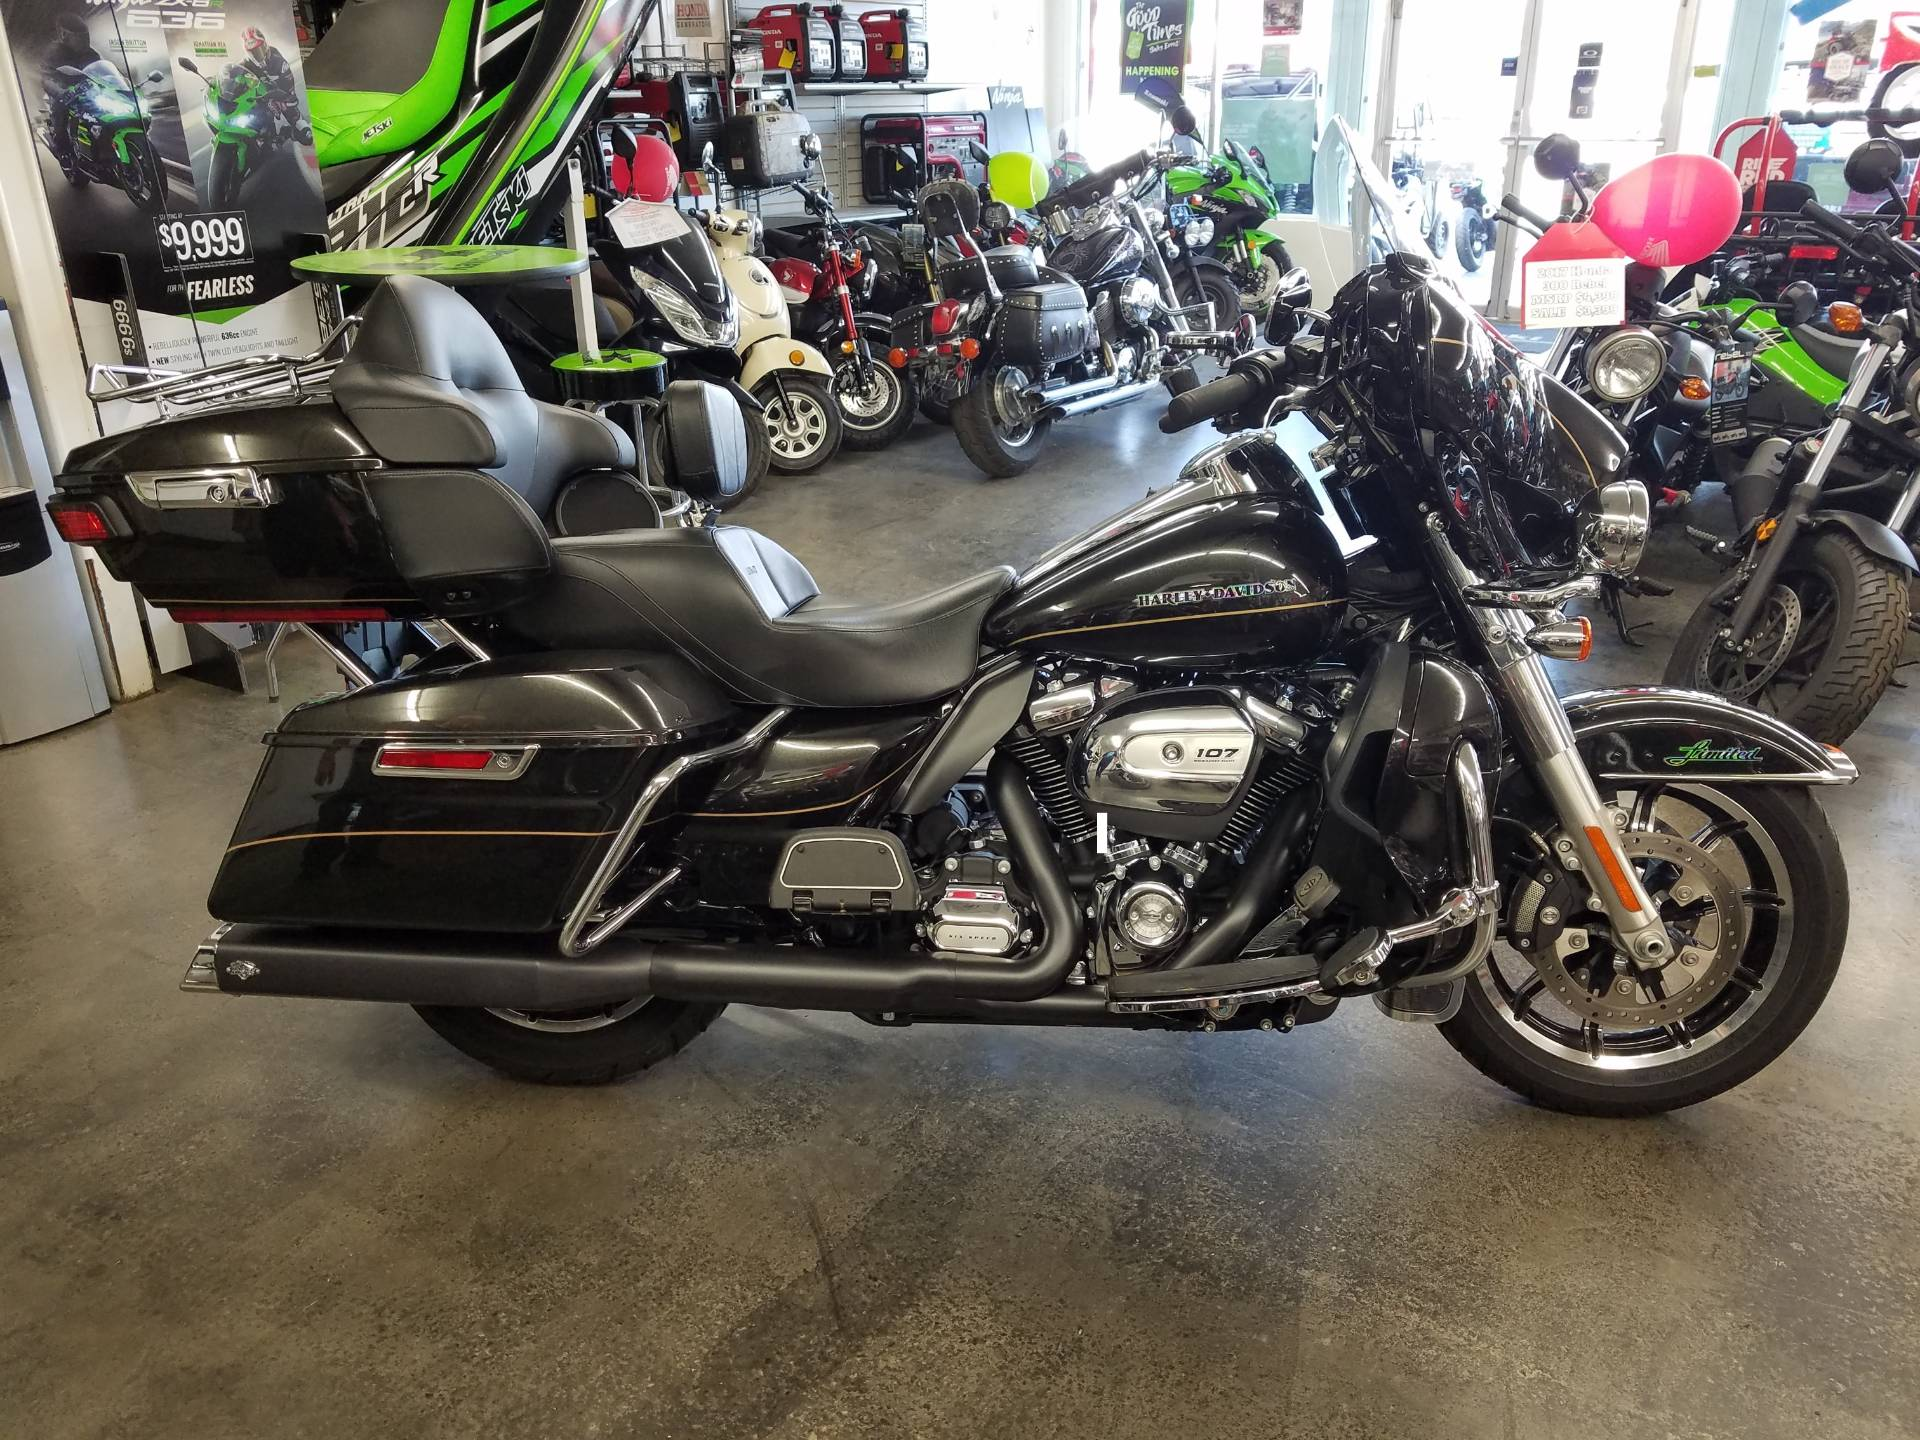 2017 Harley Davidson Ultra Limited In Fort Pierce Florida